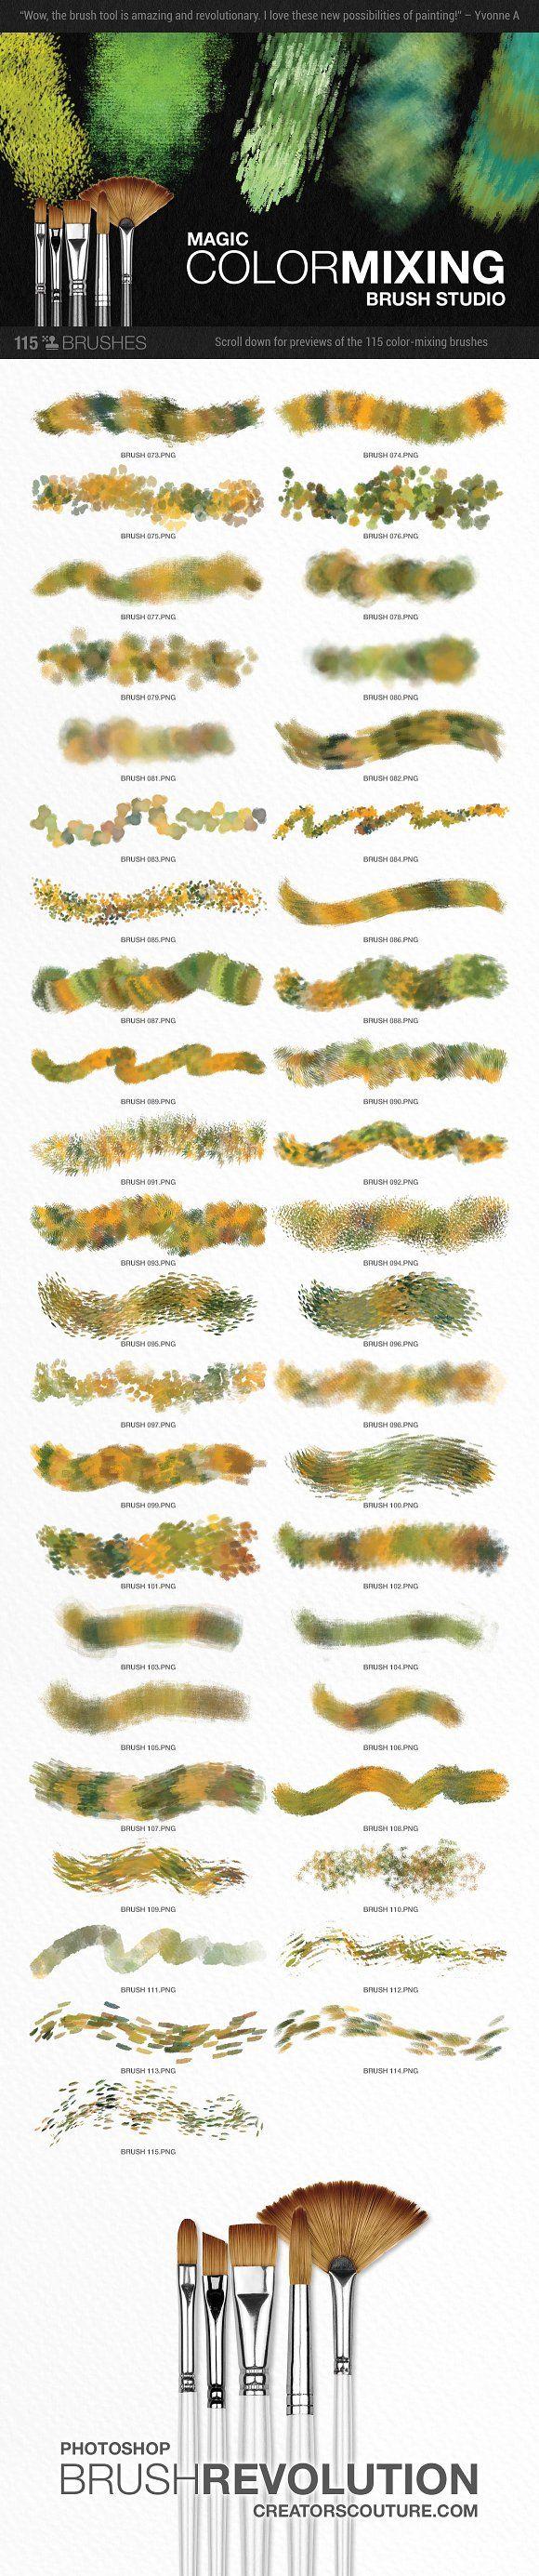 Watercolor art history brush cs6 - Modern Impressionist Ps Brush Studio